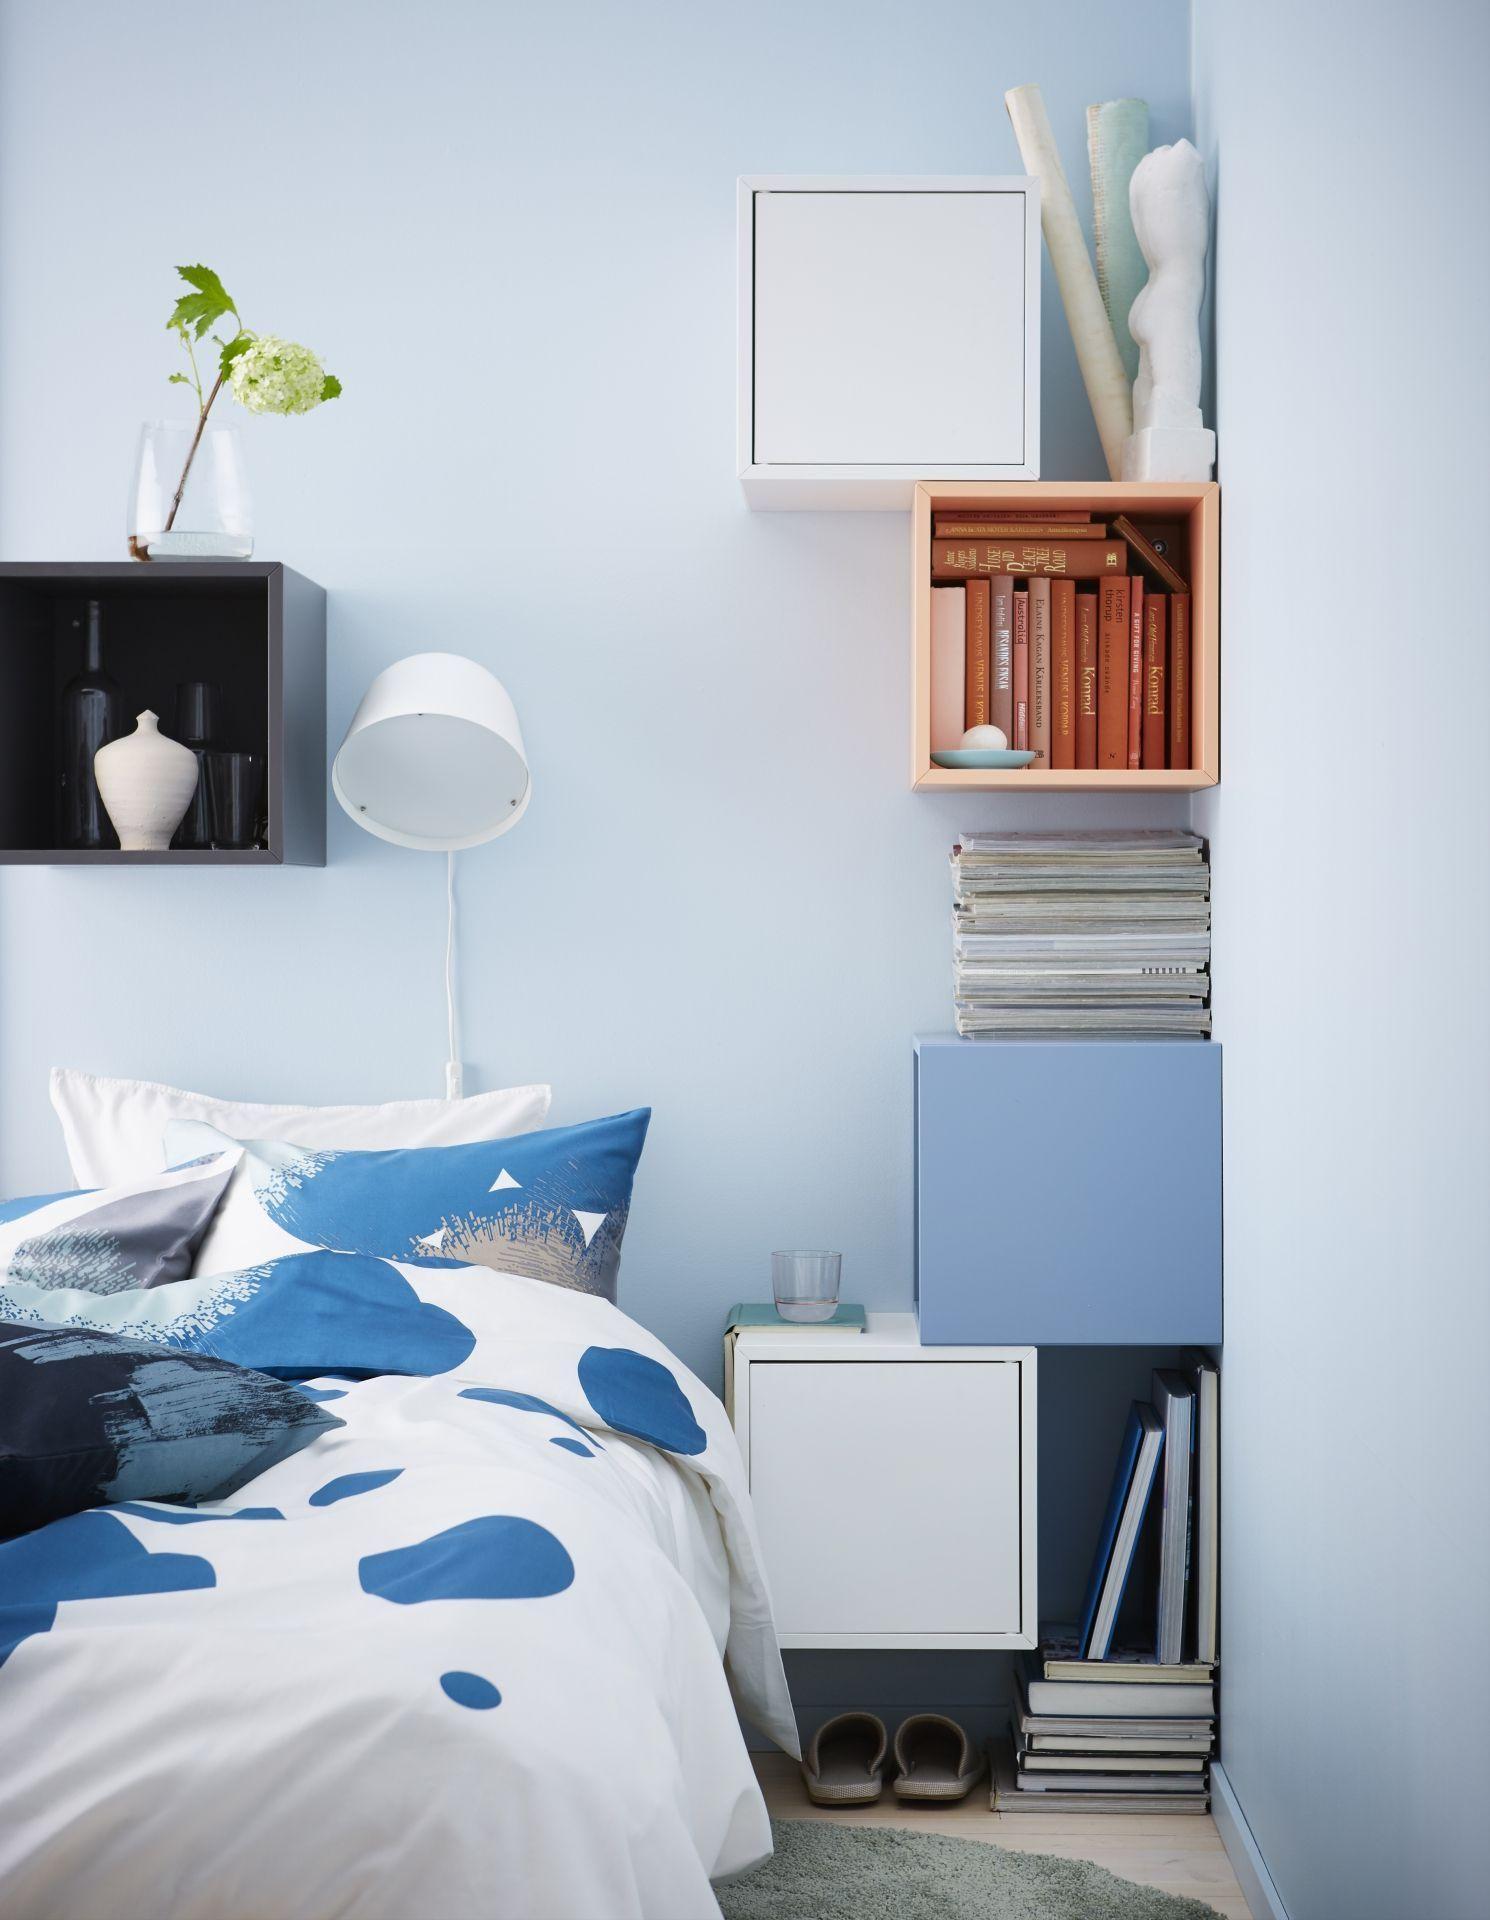 Eket Schrank Mit Tur Weiss Home Pinterest Bedroom Ikea Ikea Cabinet